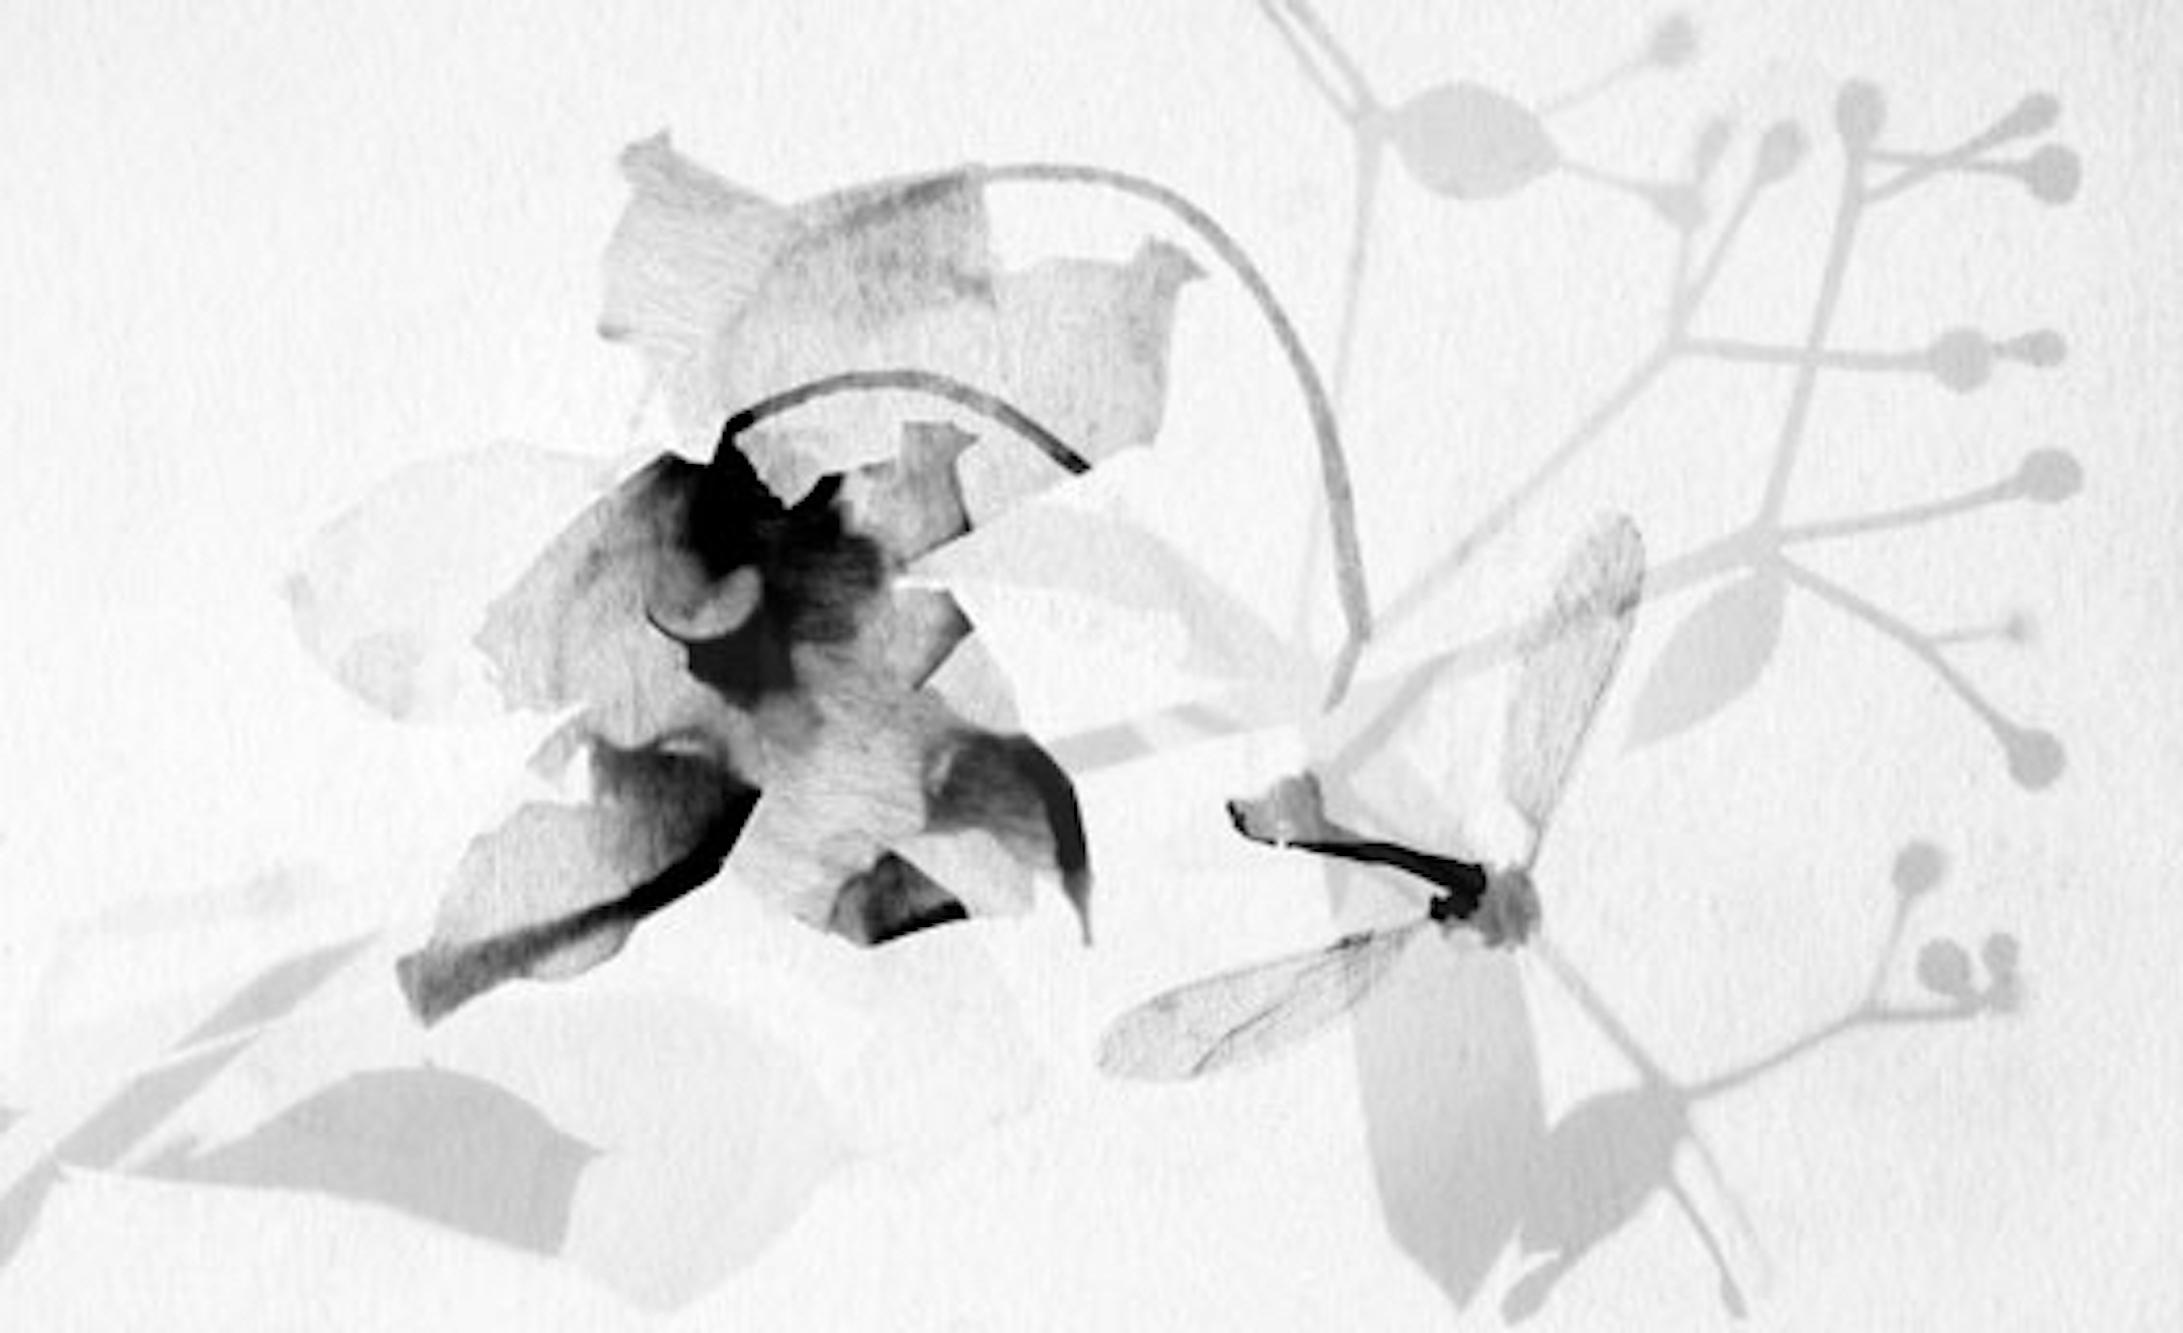 Stefania Ricci,  Insieme naturale 129 , 2006, rayogramma, stampato a pigmenti di carbone su carta cotone, 81 x 112 cm, courtesy Stefania Ricci